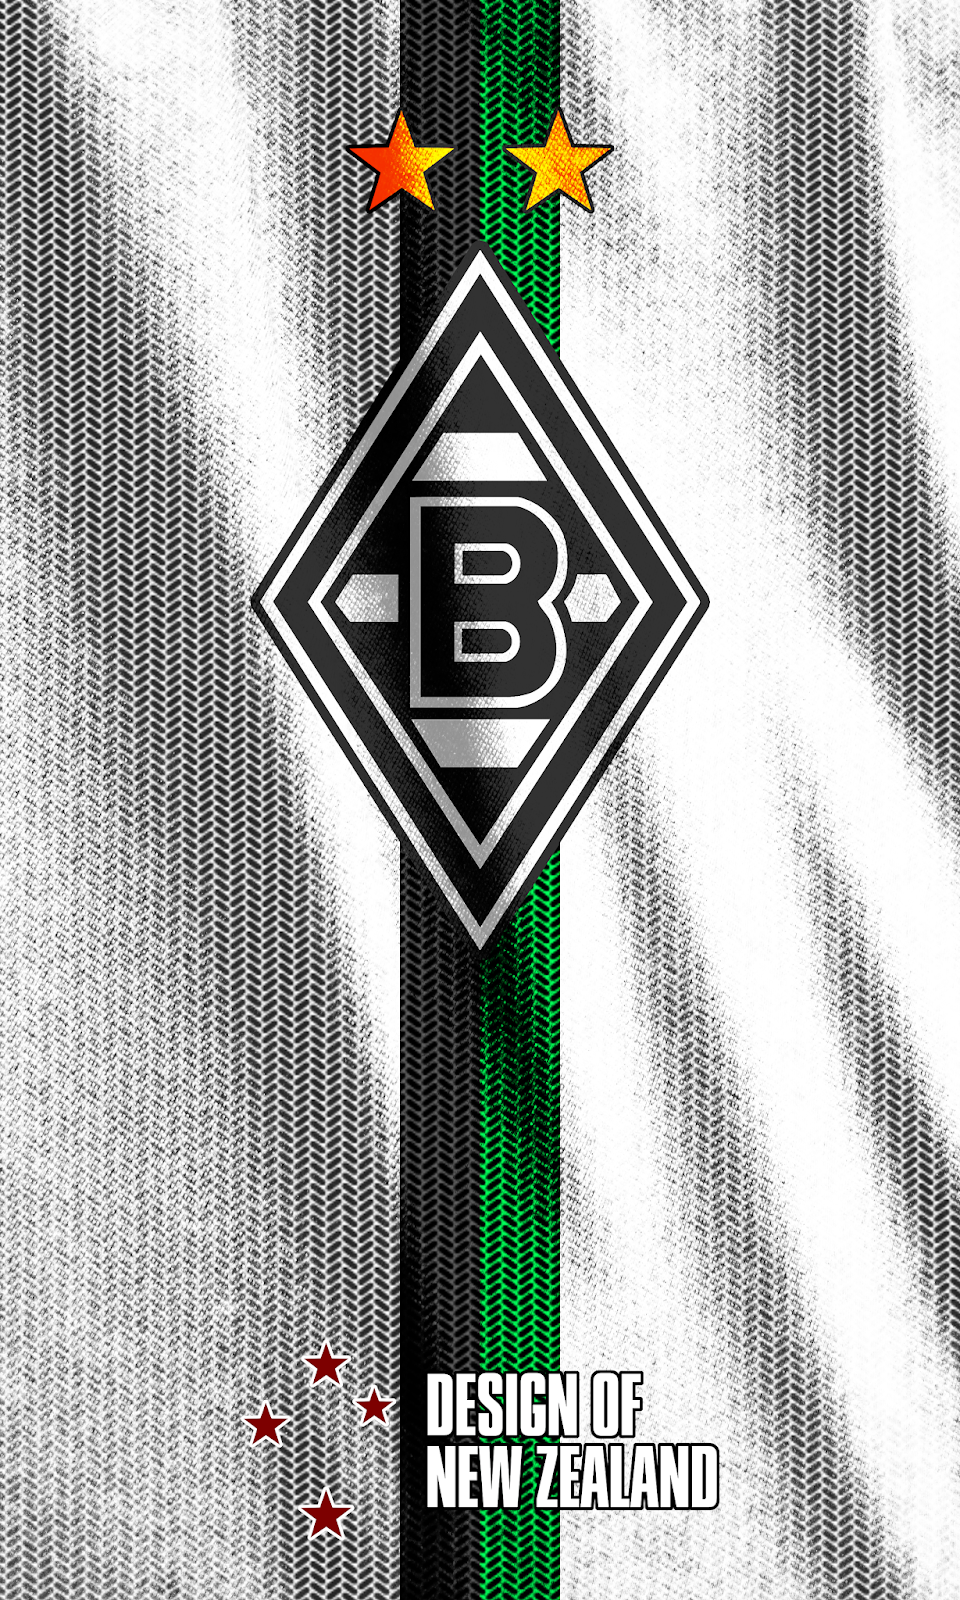 Wallpaper Borussia Vfl Monchengladbach Borussia Borussia Monchengladbach Monchengladbach